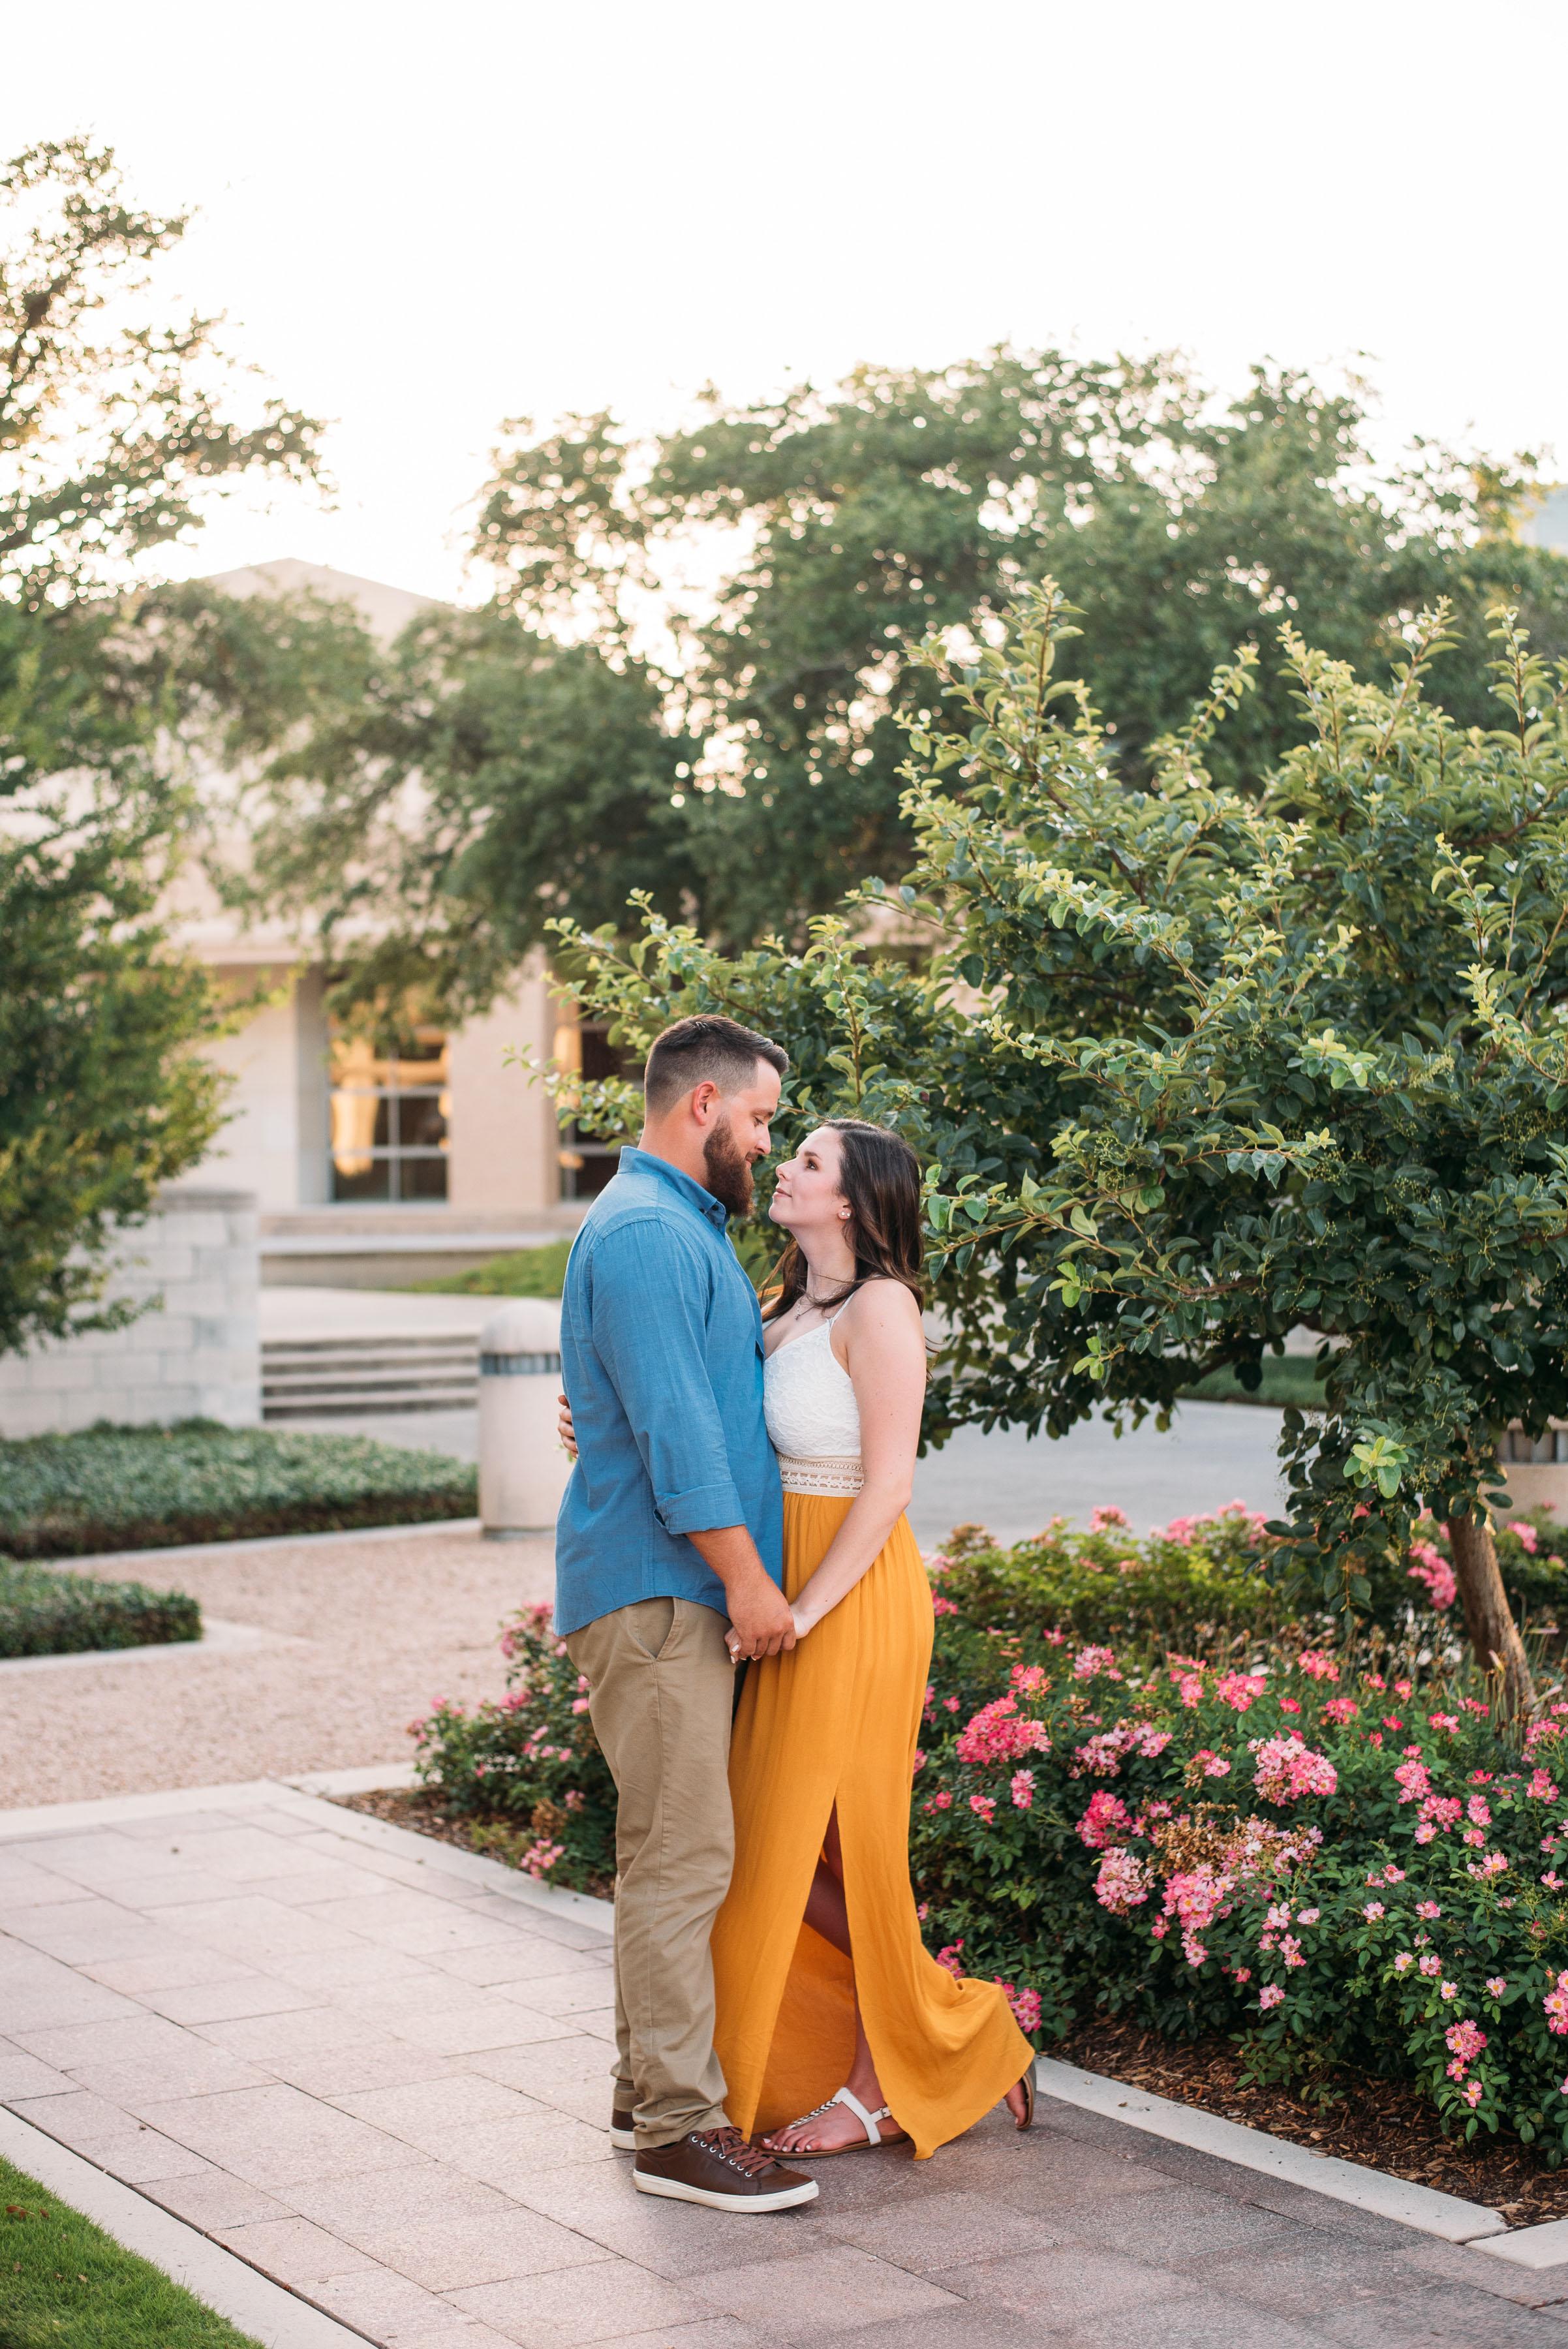 George-Bush-Library-Texas-A&M-University-Engagement-College-Station-Wedding-Photographer-San-Angel-Photo-Mark-Jenna-Matt-Century-Tree-04.jpg